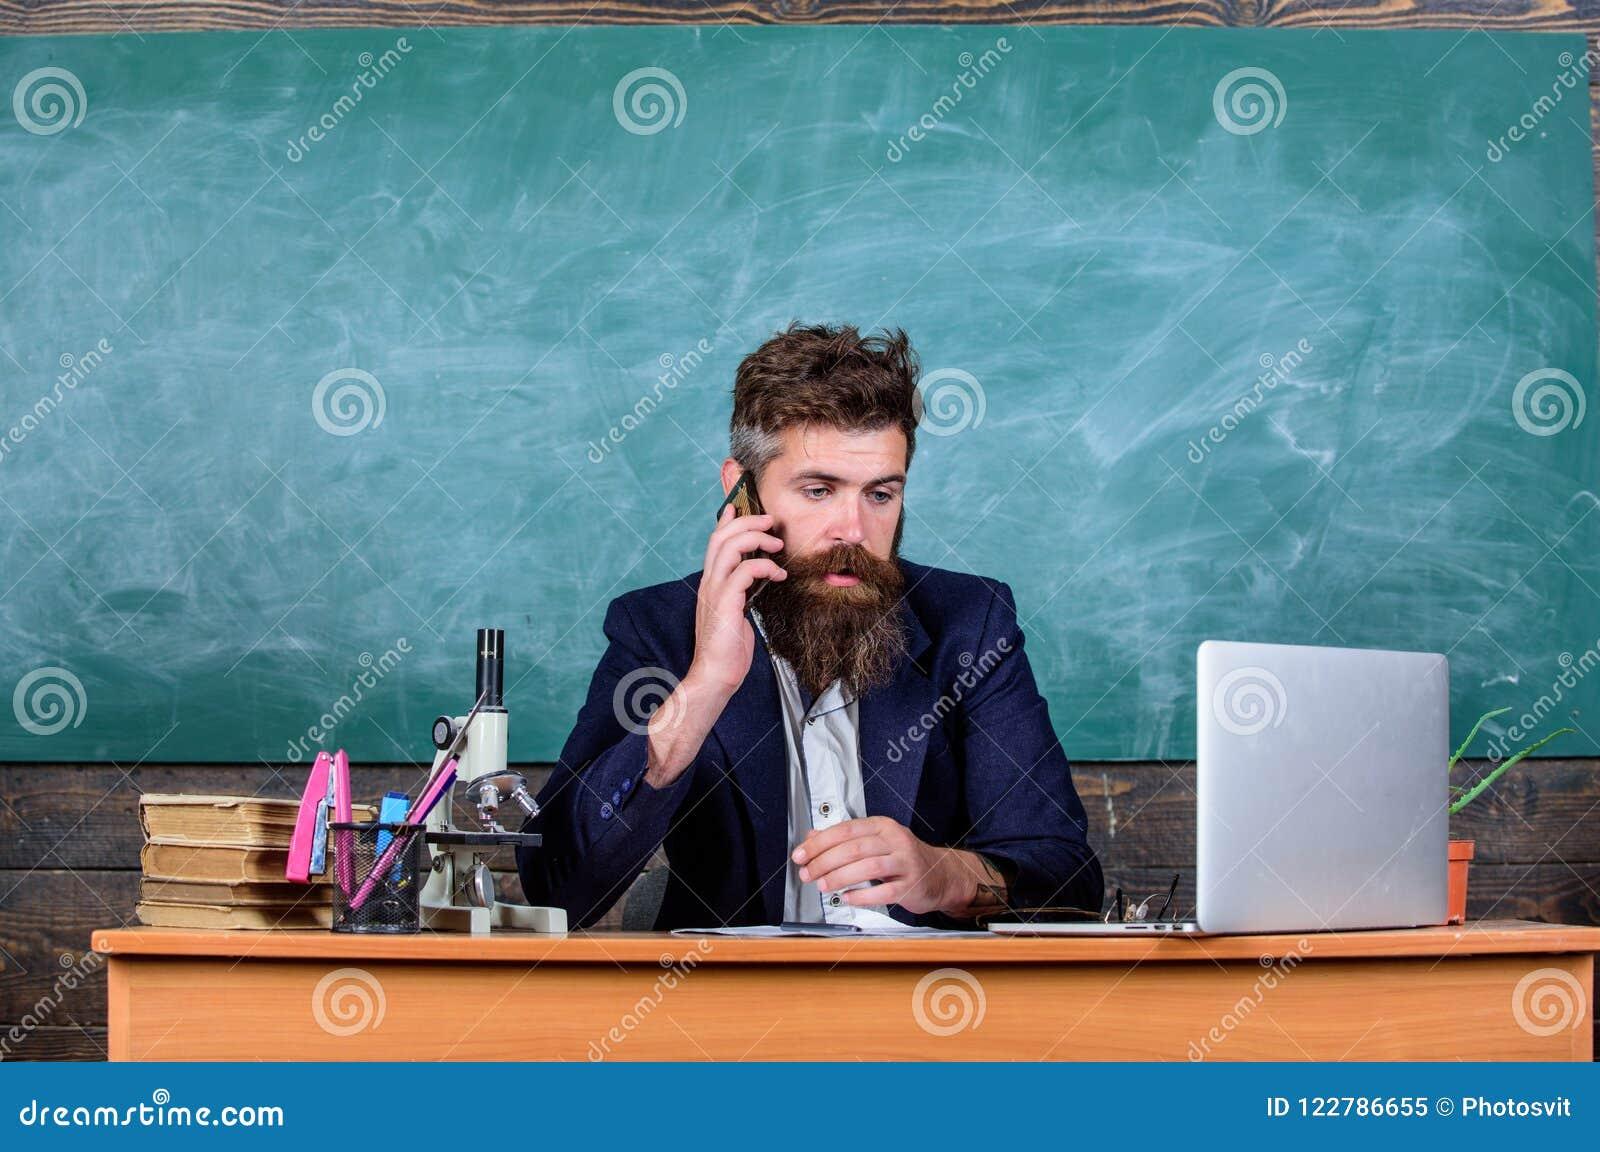 principal circa scuola leraar rapporteren roepen schoolleraar schoolhoofd ouders zorgen communicatie om te genitori insegnante maestro chiama risulta esame cure